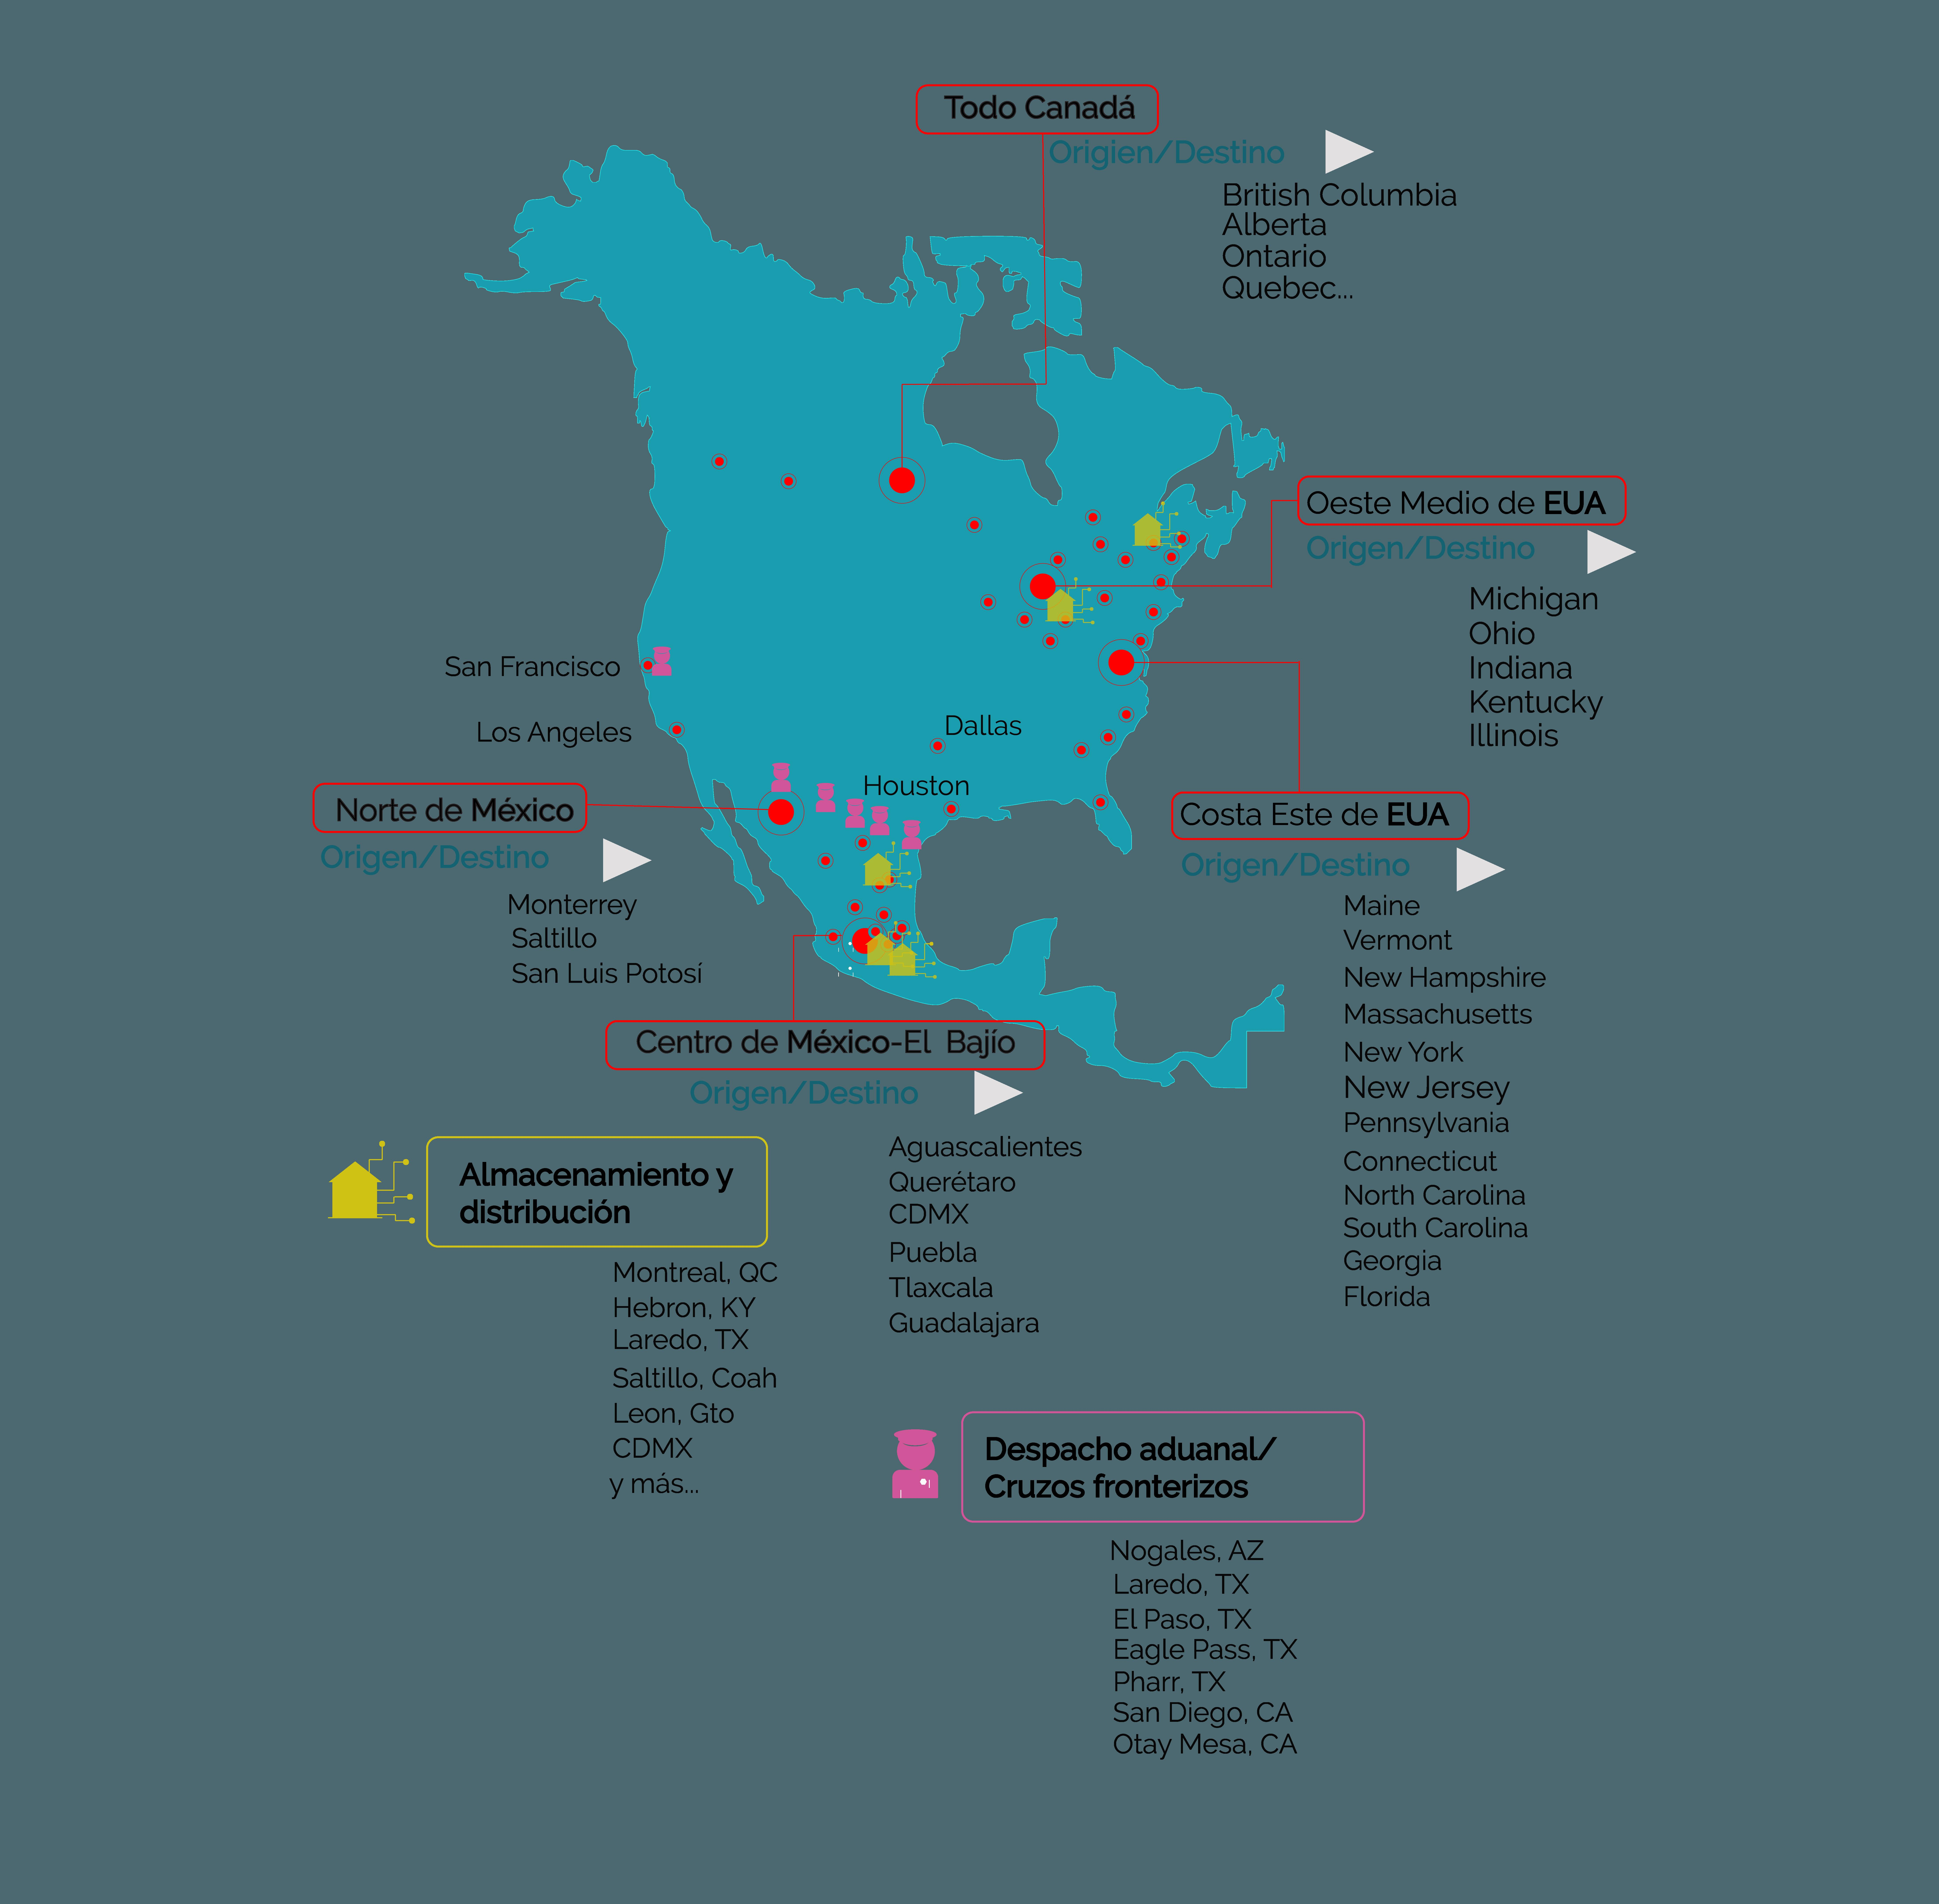 Mapa sobre el transporte terrestre de carga a través de Norteamérica